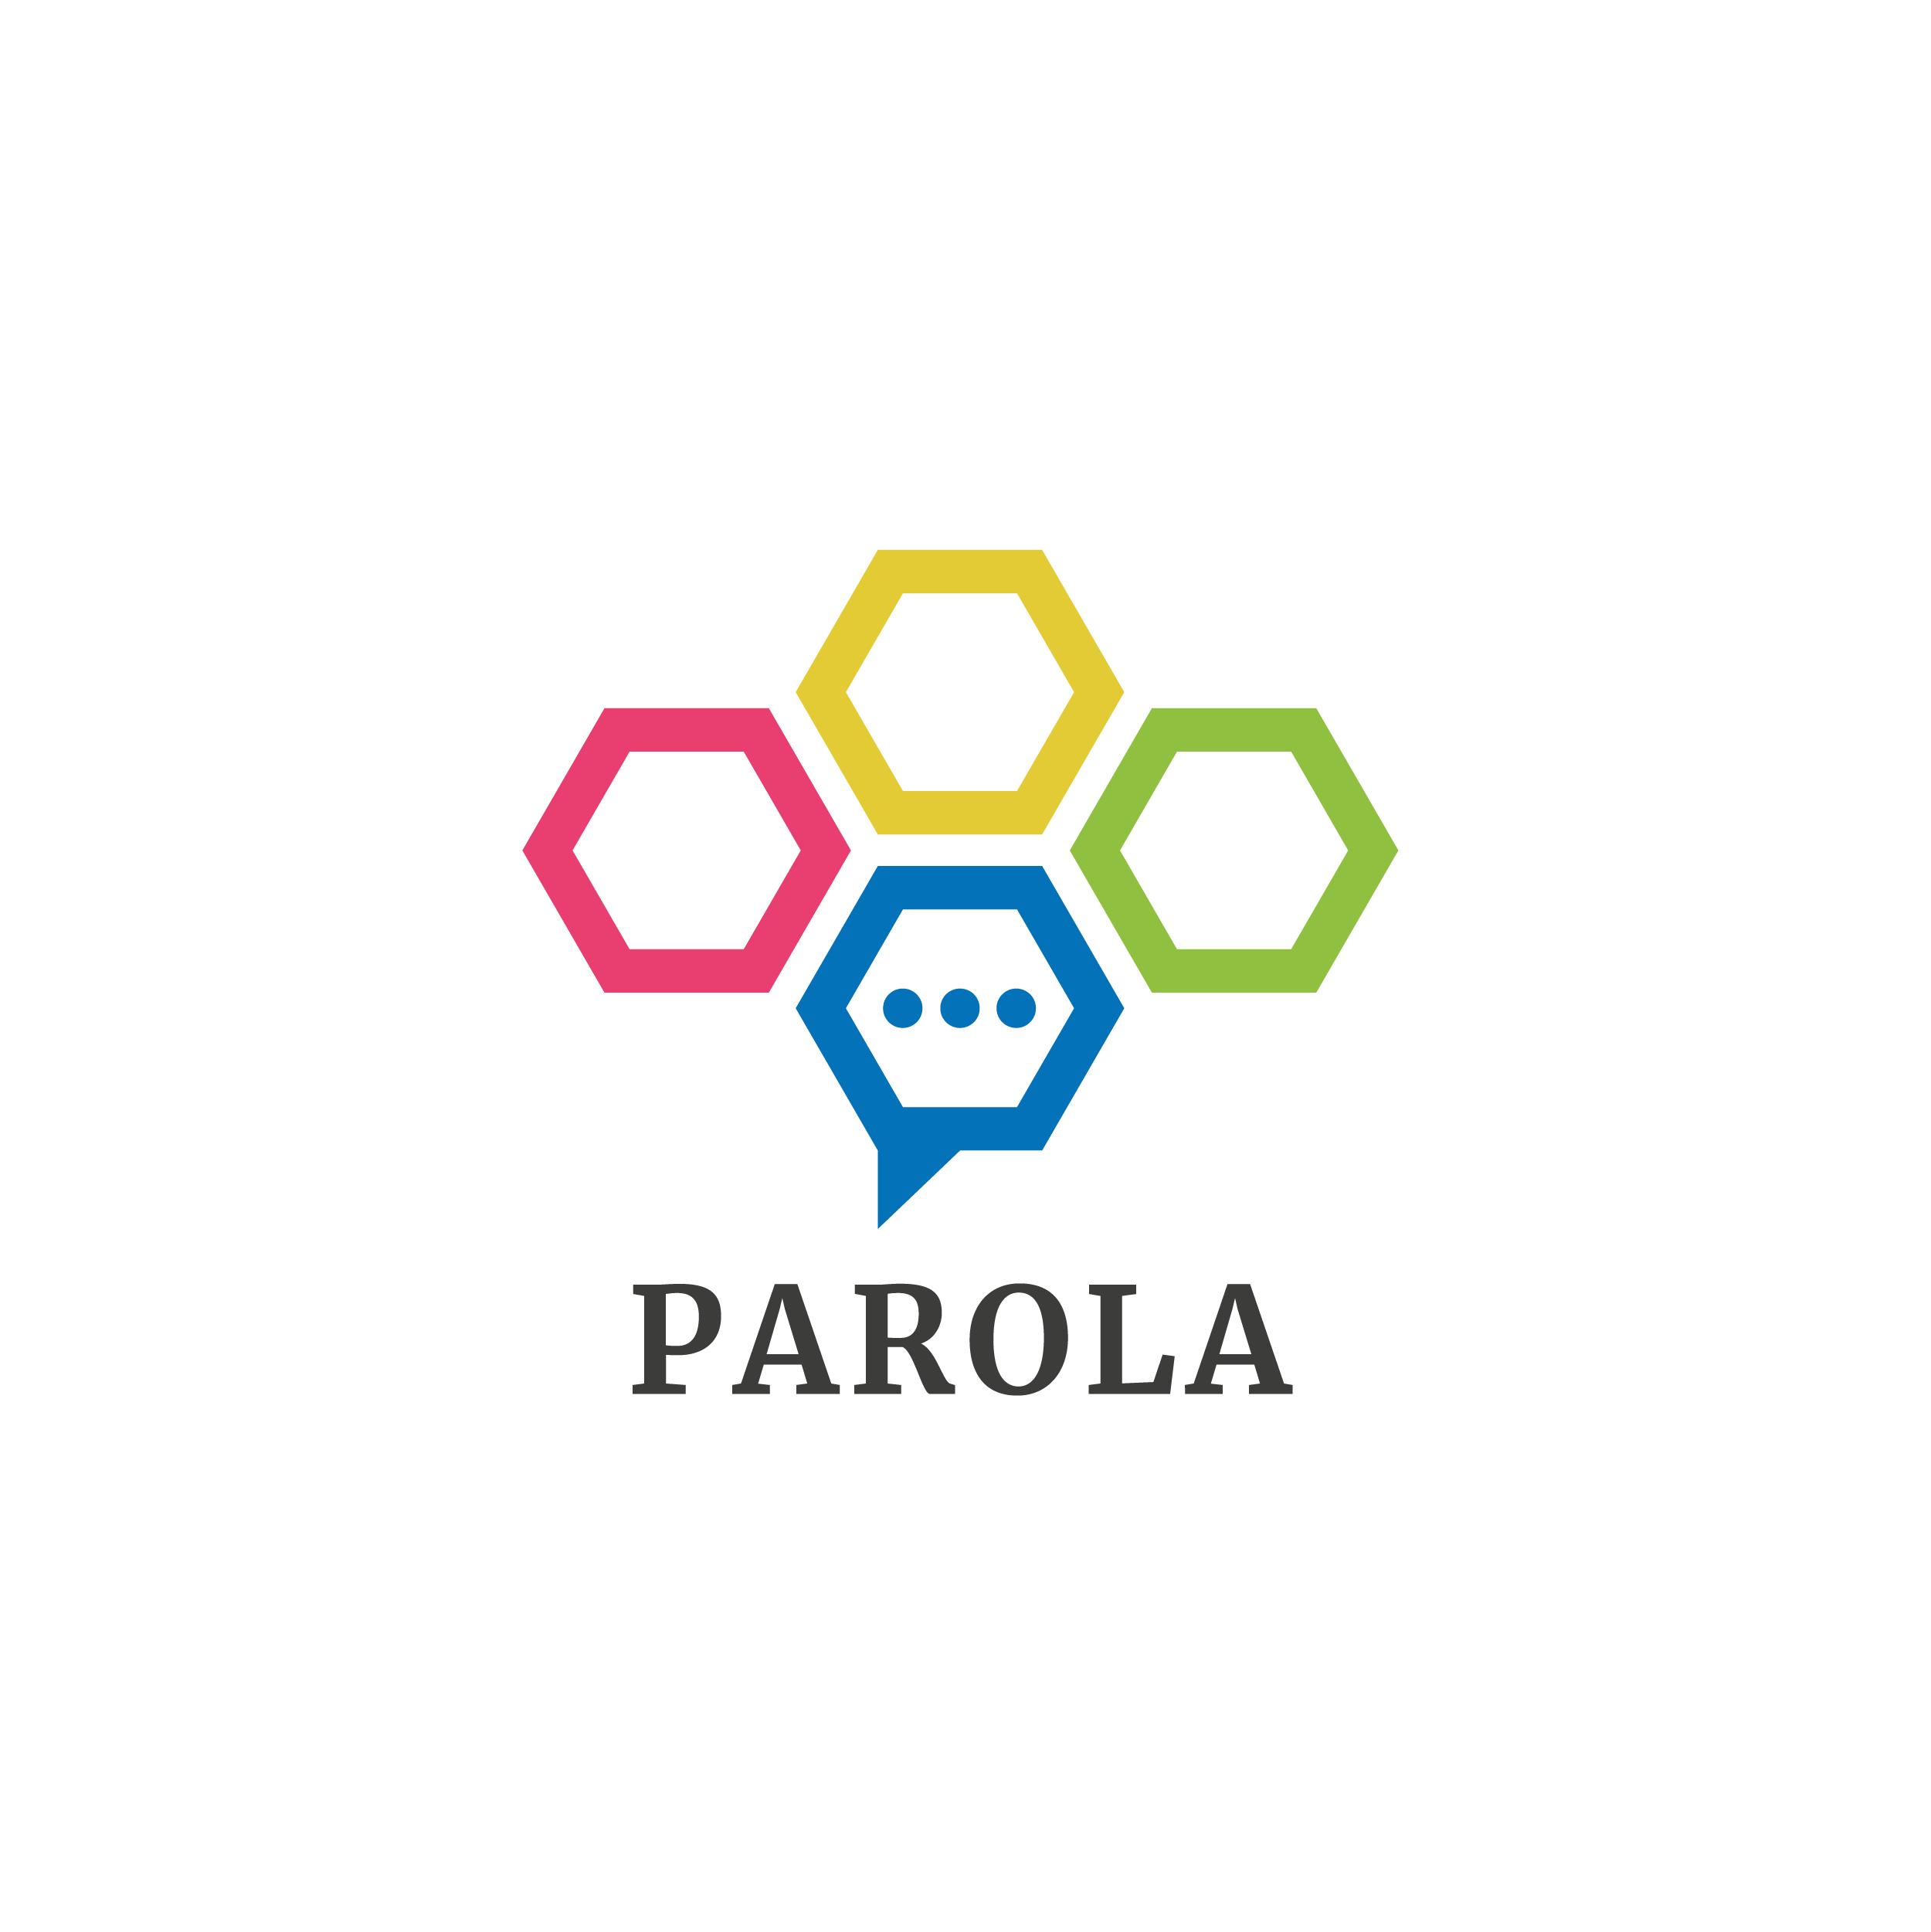 LogoFolio - Parola-01